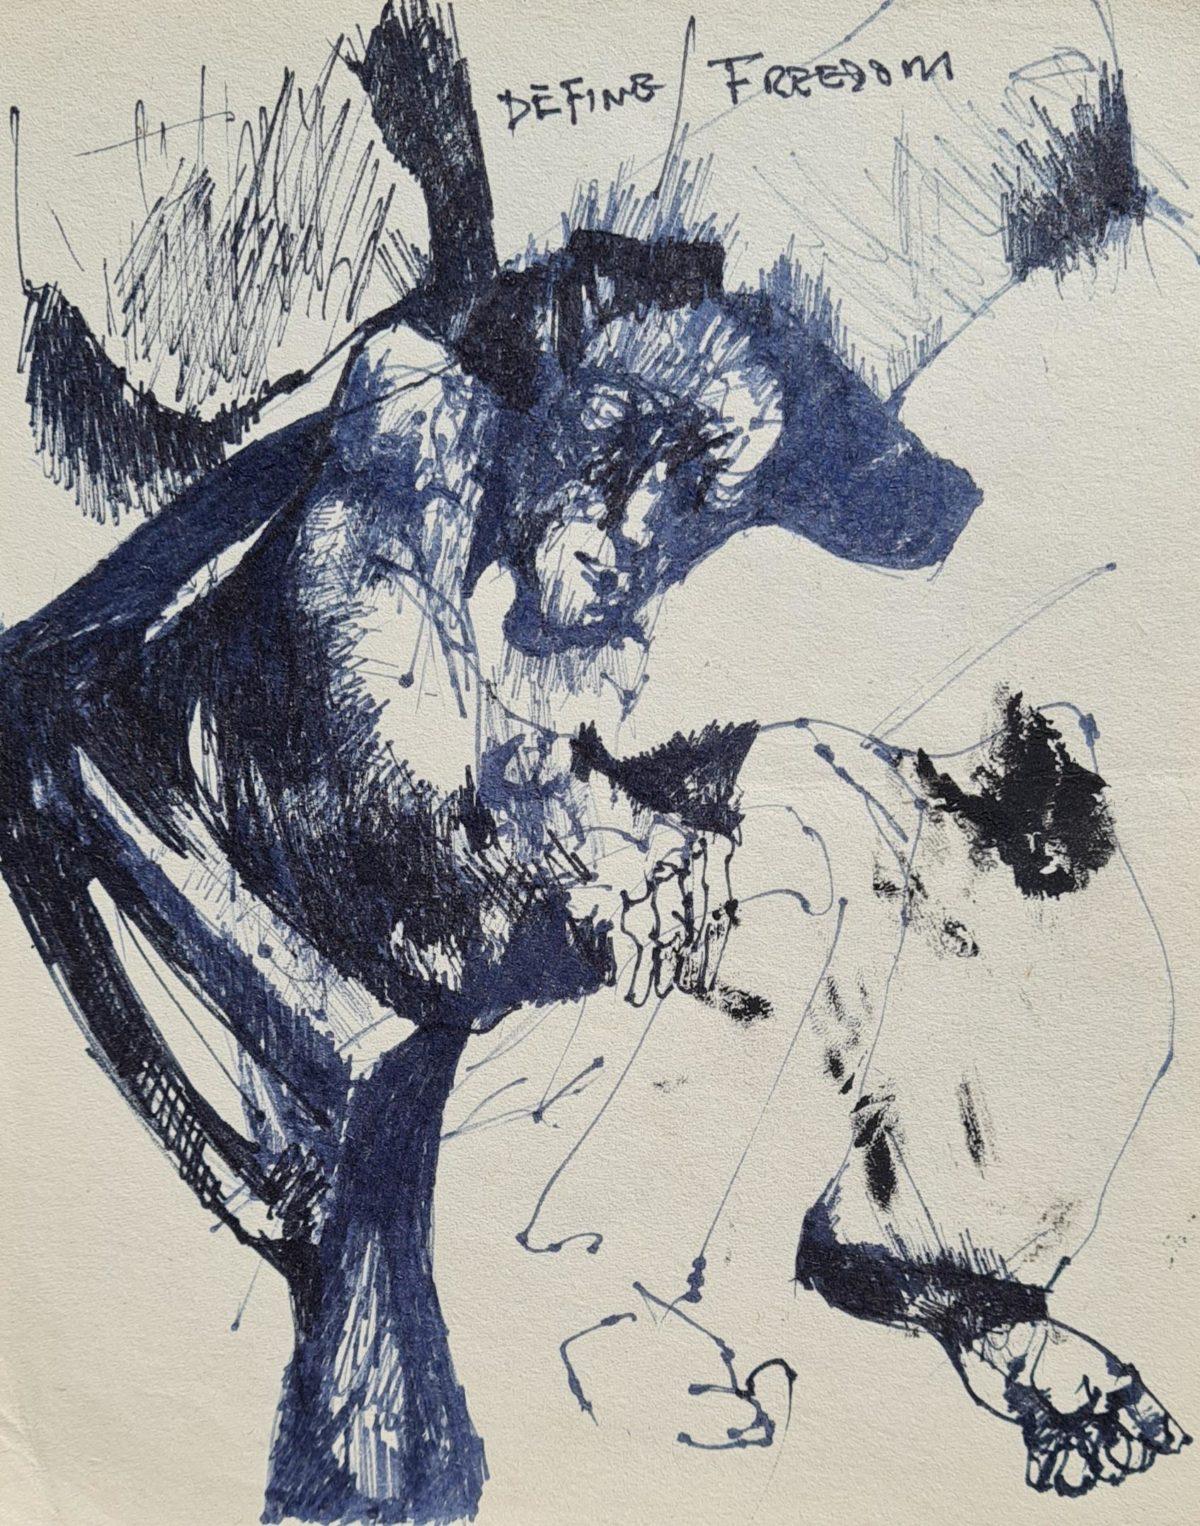 Ezrom Legae - ' Define Freedom ' 1996